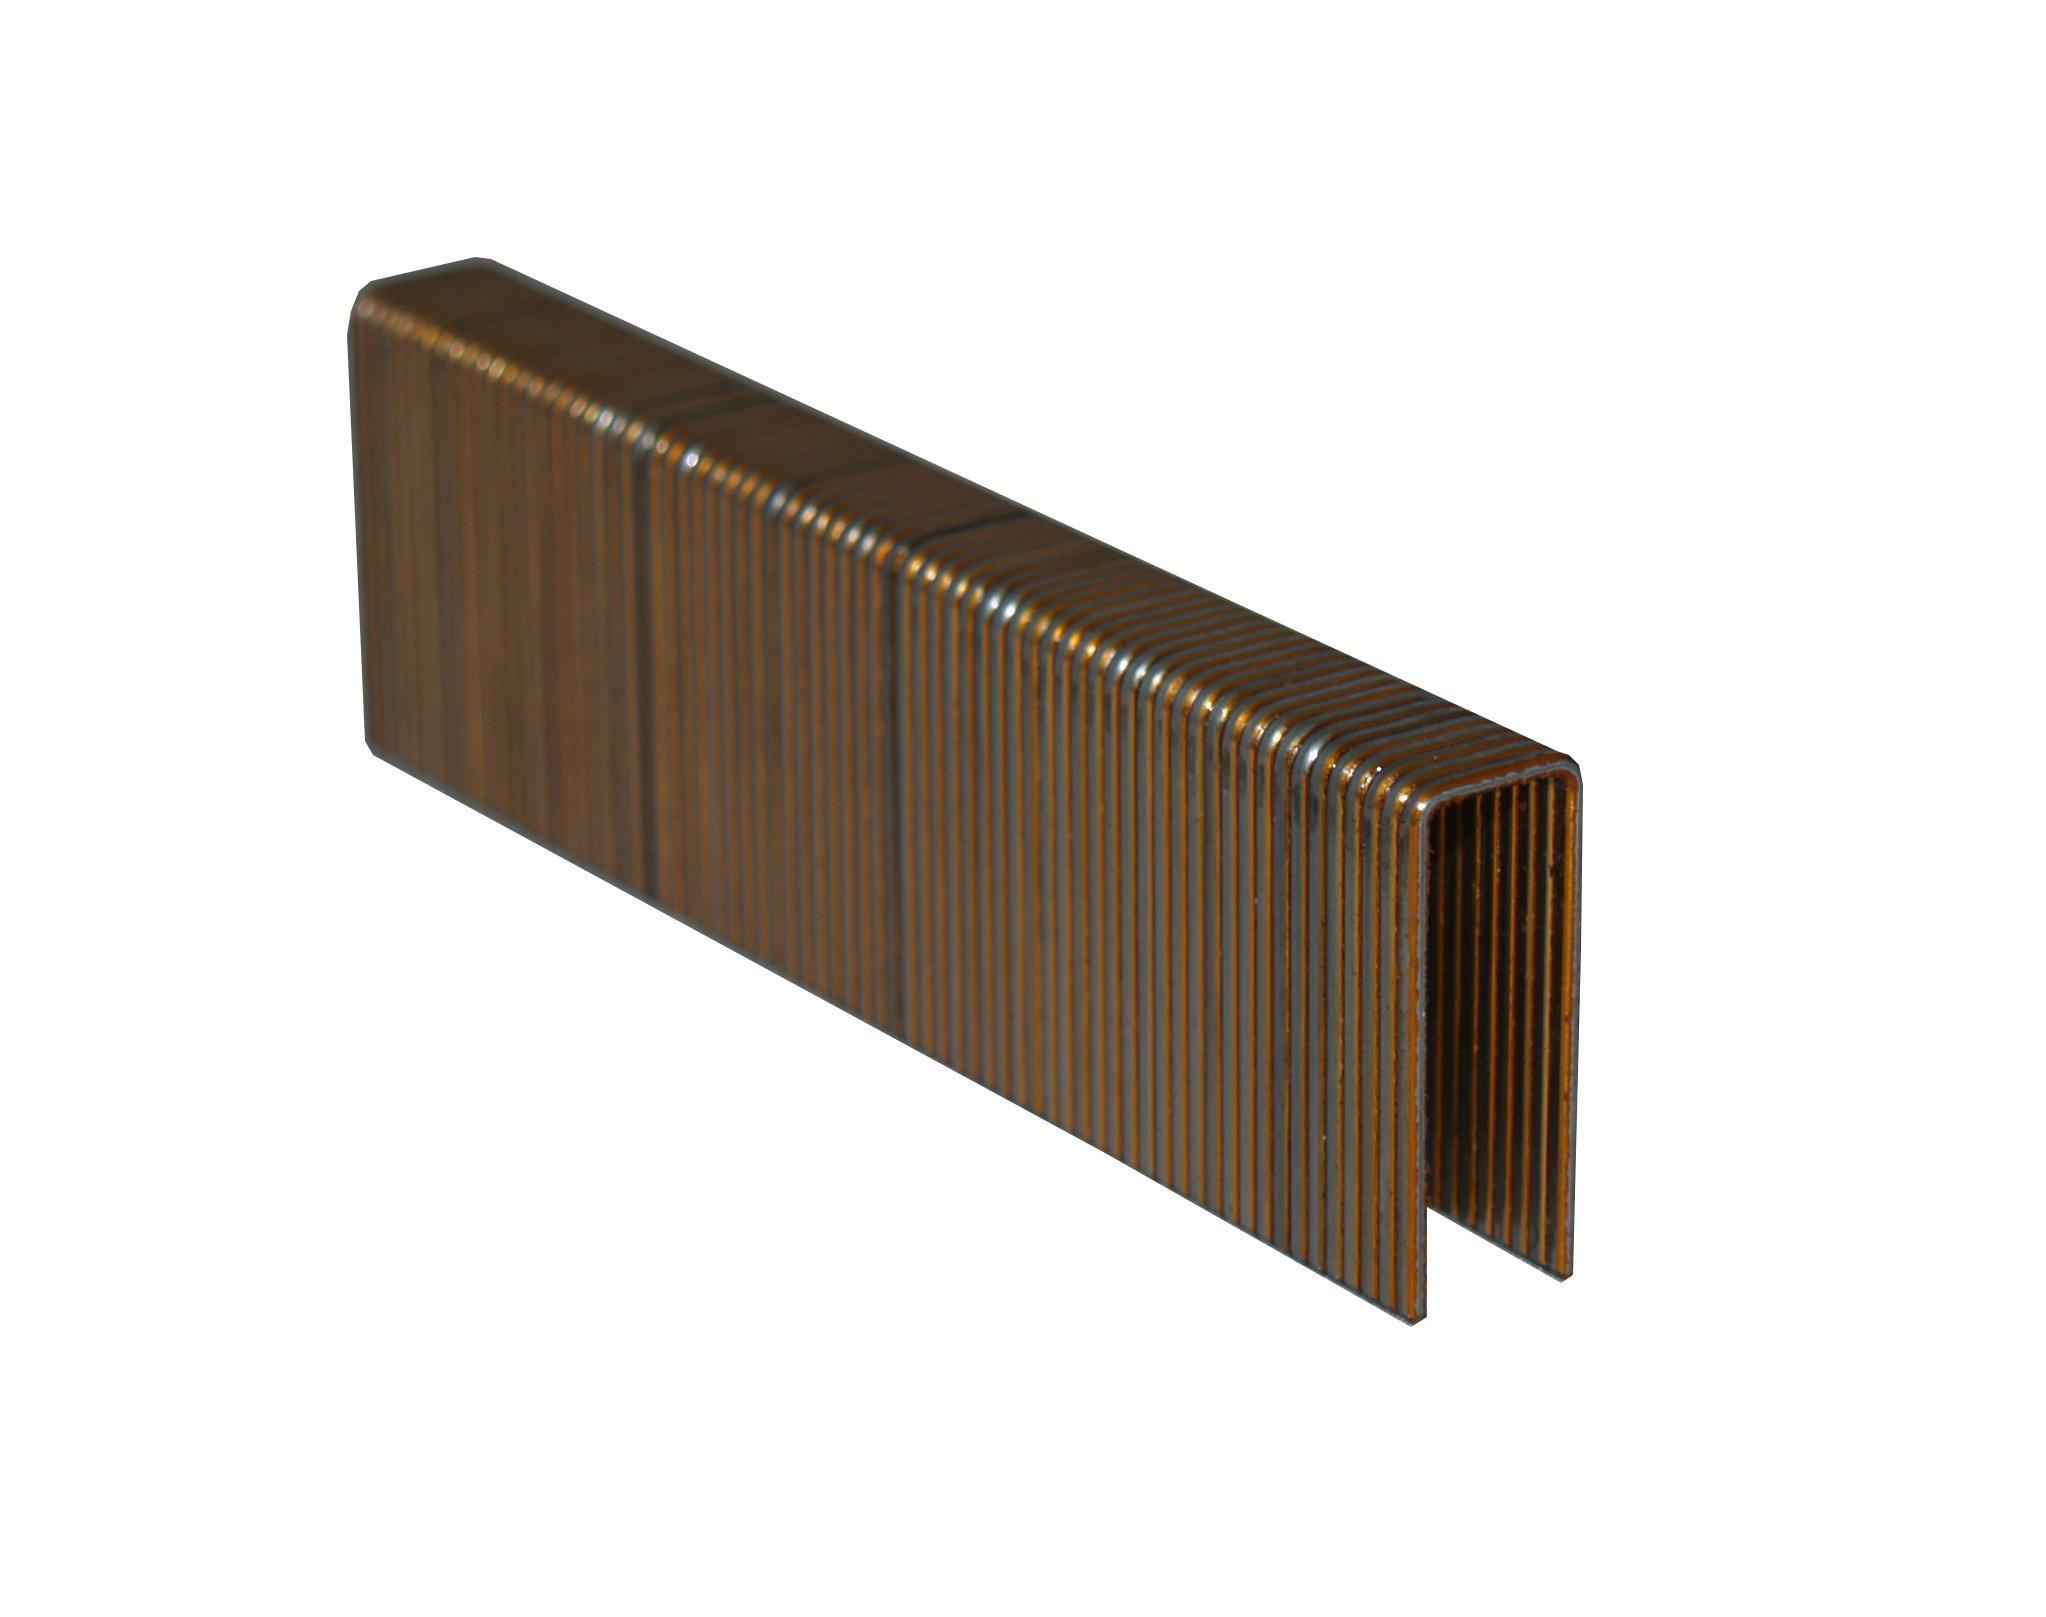 Spot Nails 6614PG-10M 7/16-Inch 16-Gauge Galvanized Crown Senco Style Sheathing Staples, 10000-Count, 1-3/4-Inch Leg